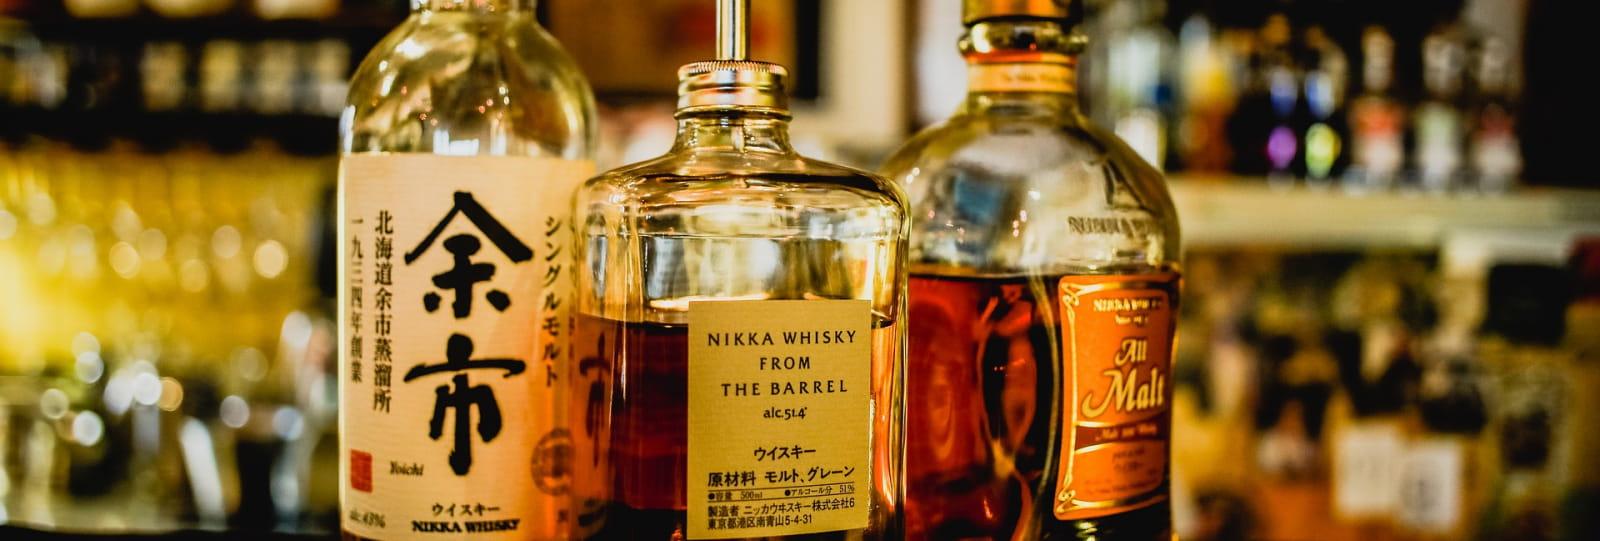 Whiskies du Monde - Terres de Syrah